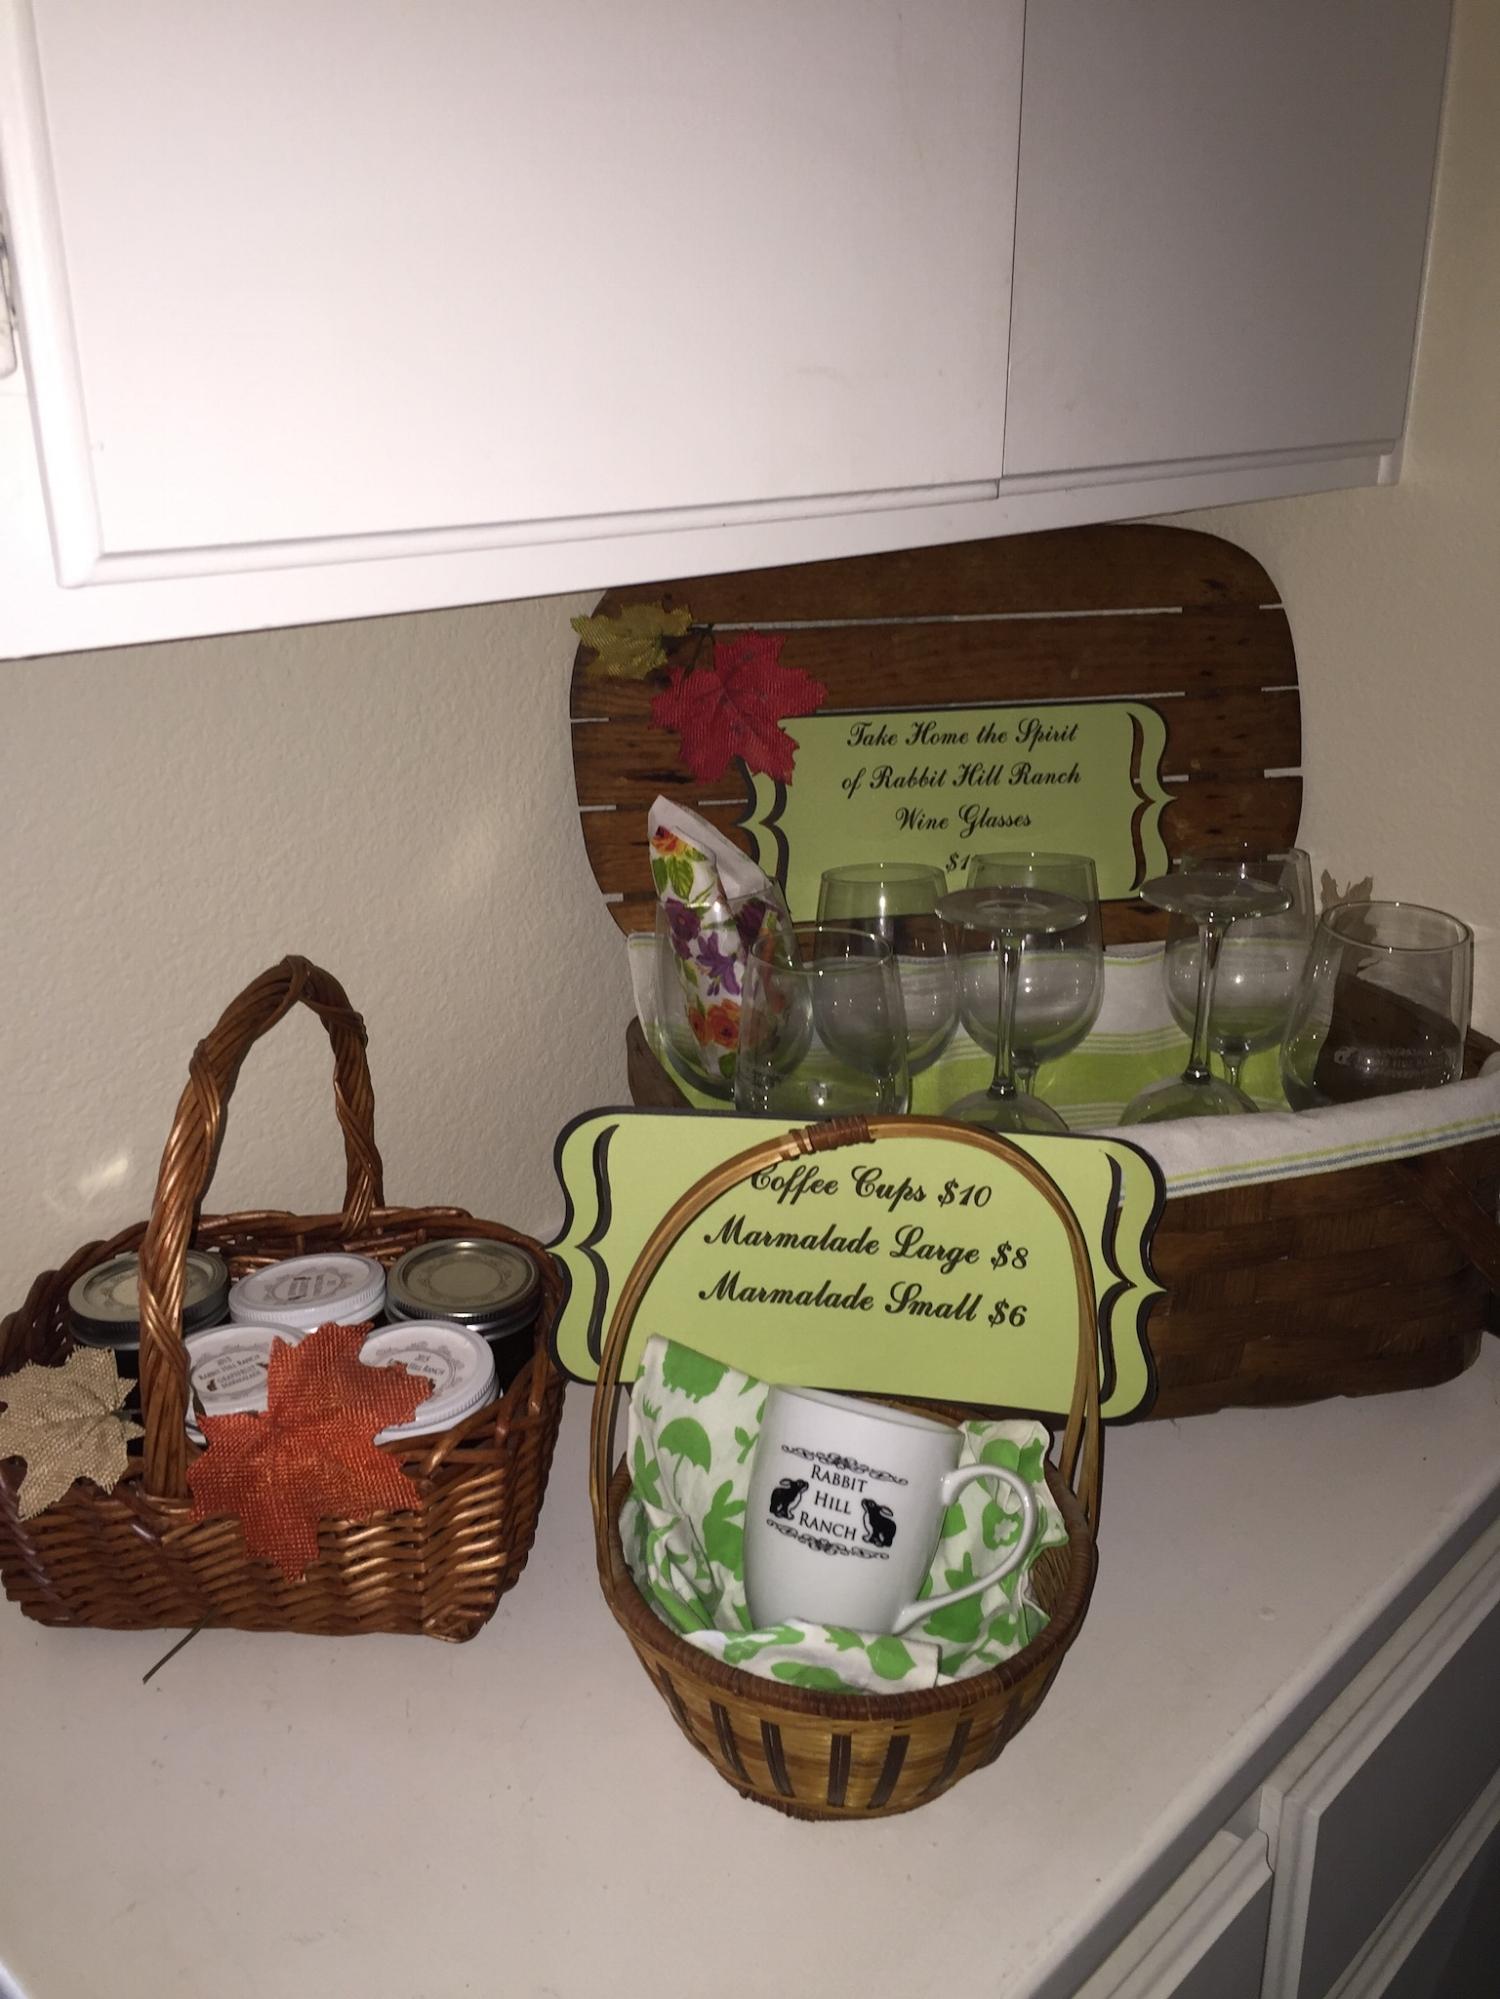 RHR mugs, wine glasses and marmalade